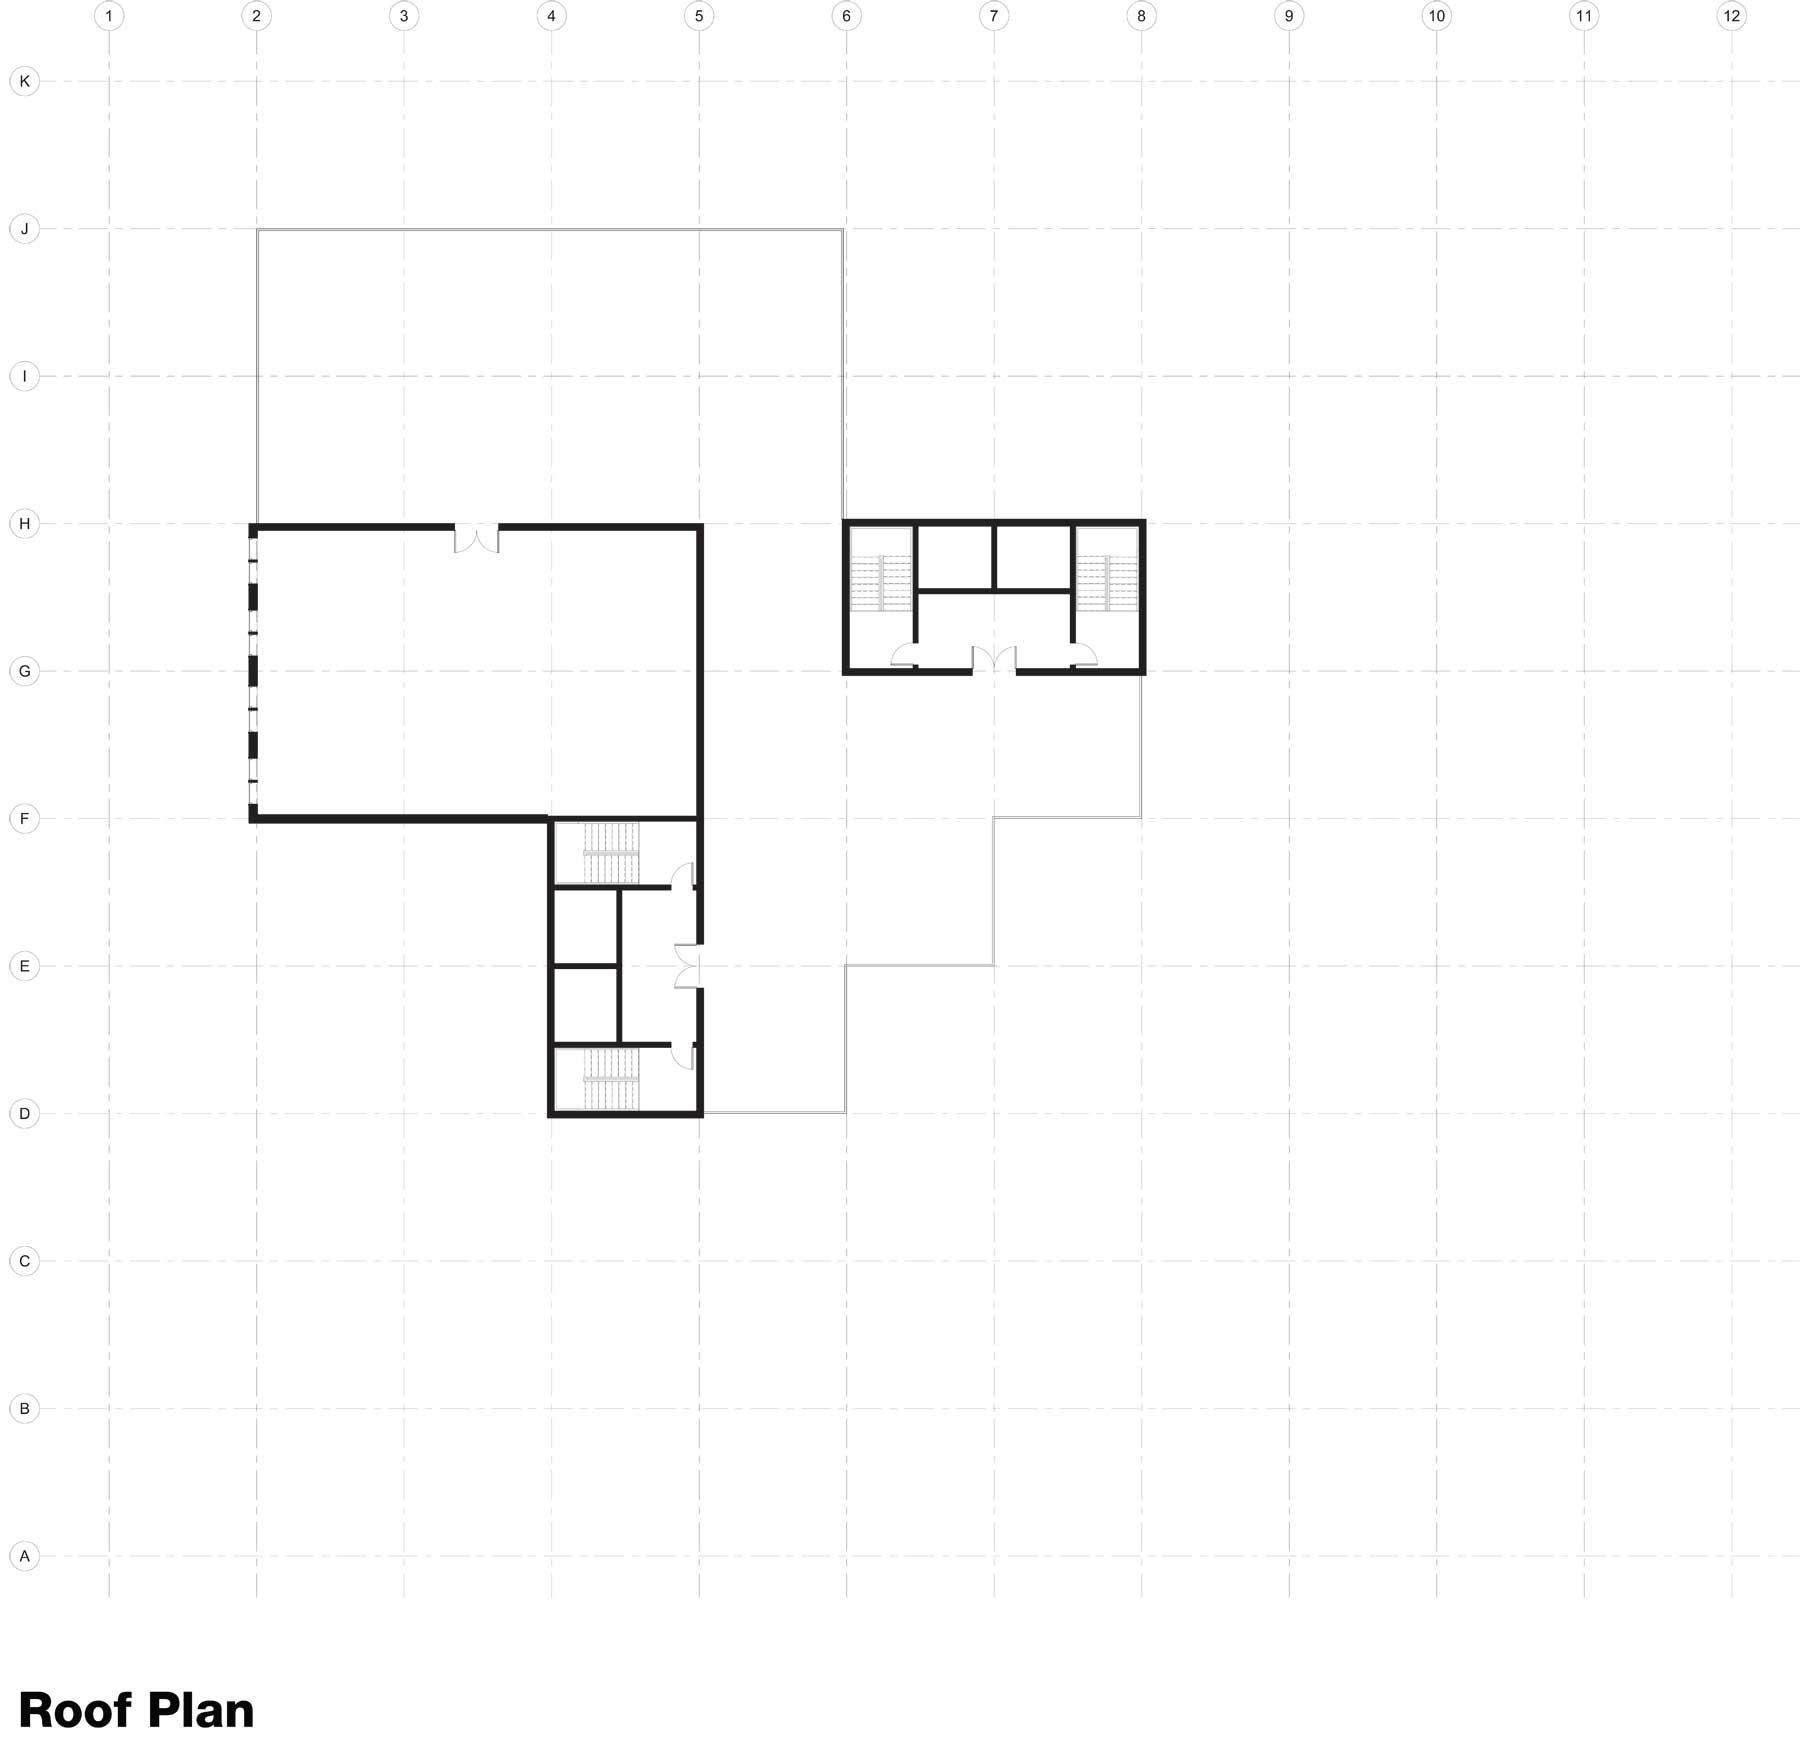 30x30-Intergenerational-Co-Living-Roof-Plan.jpg